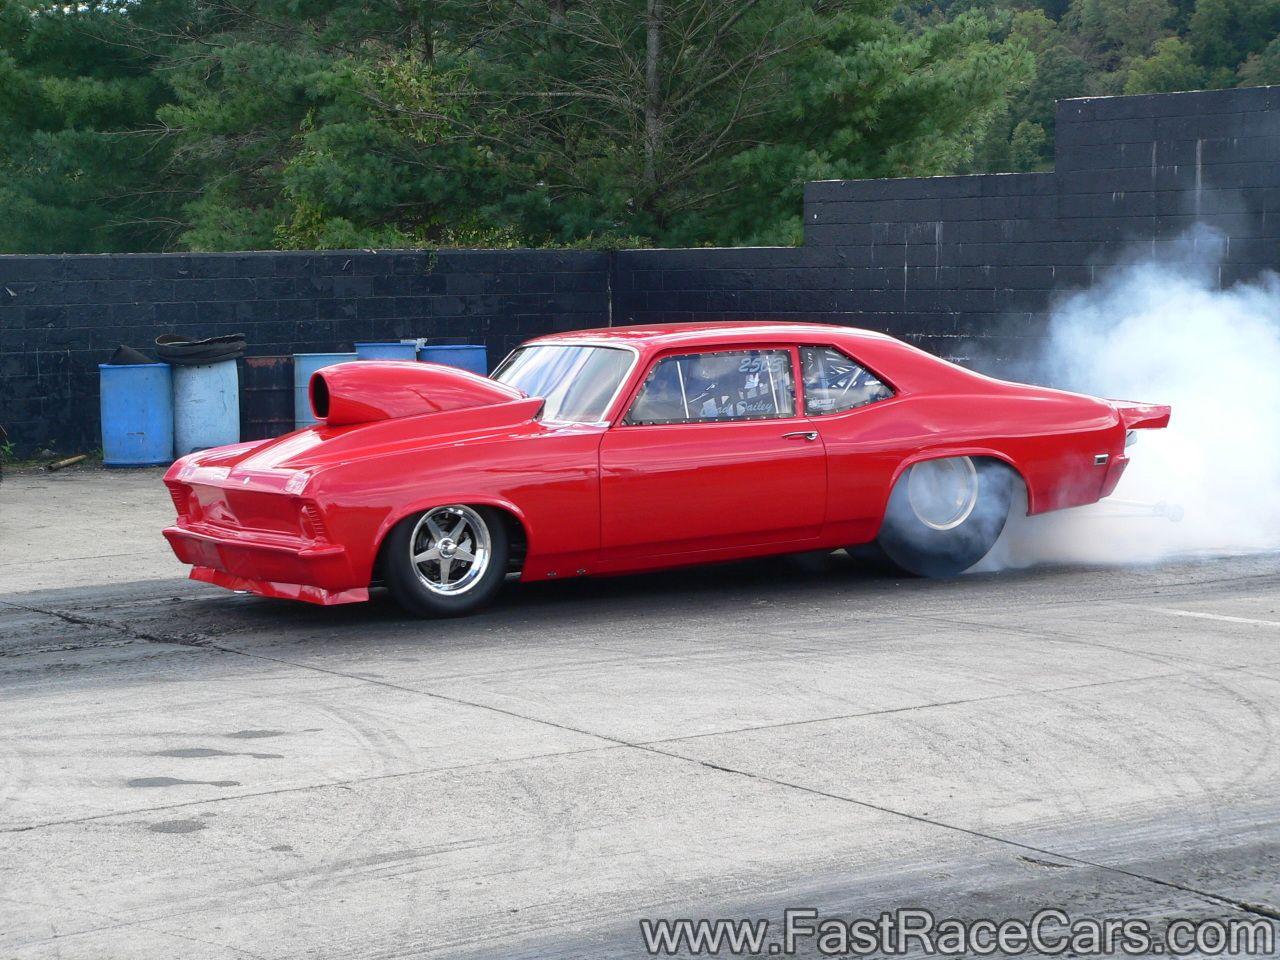 Drag cars drag race cars novas picture of red nova drag car doing